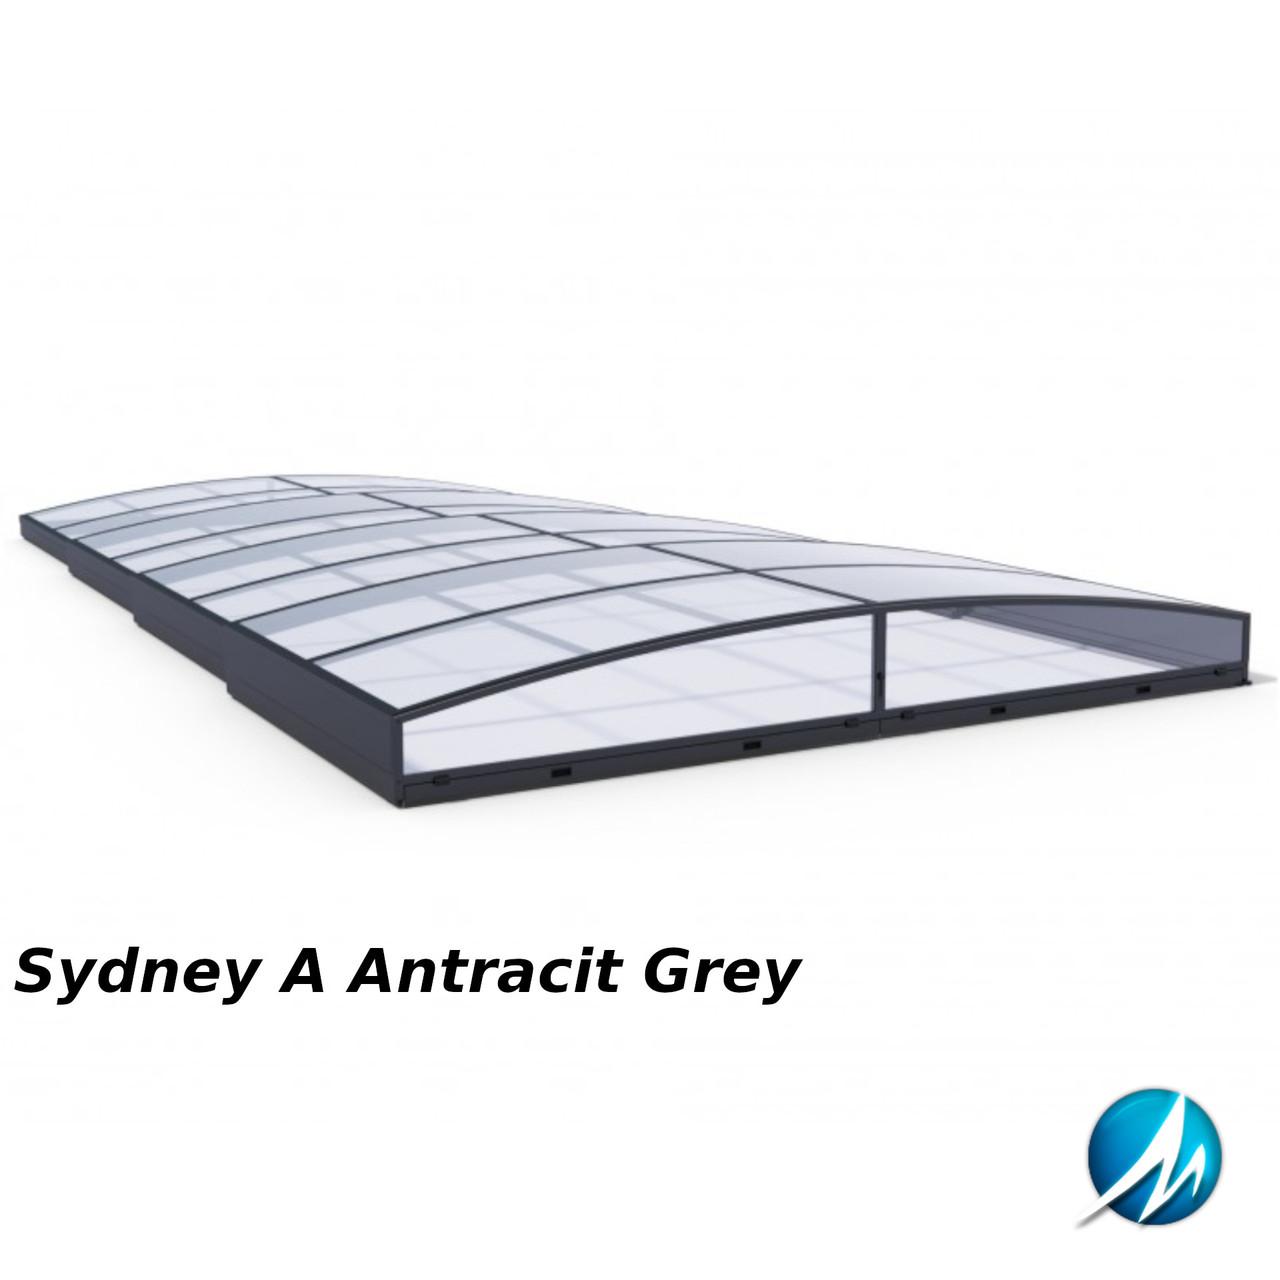 Павильон для бассейна Sydney A 3,86х6,46х0,45м - Antracit Grey